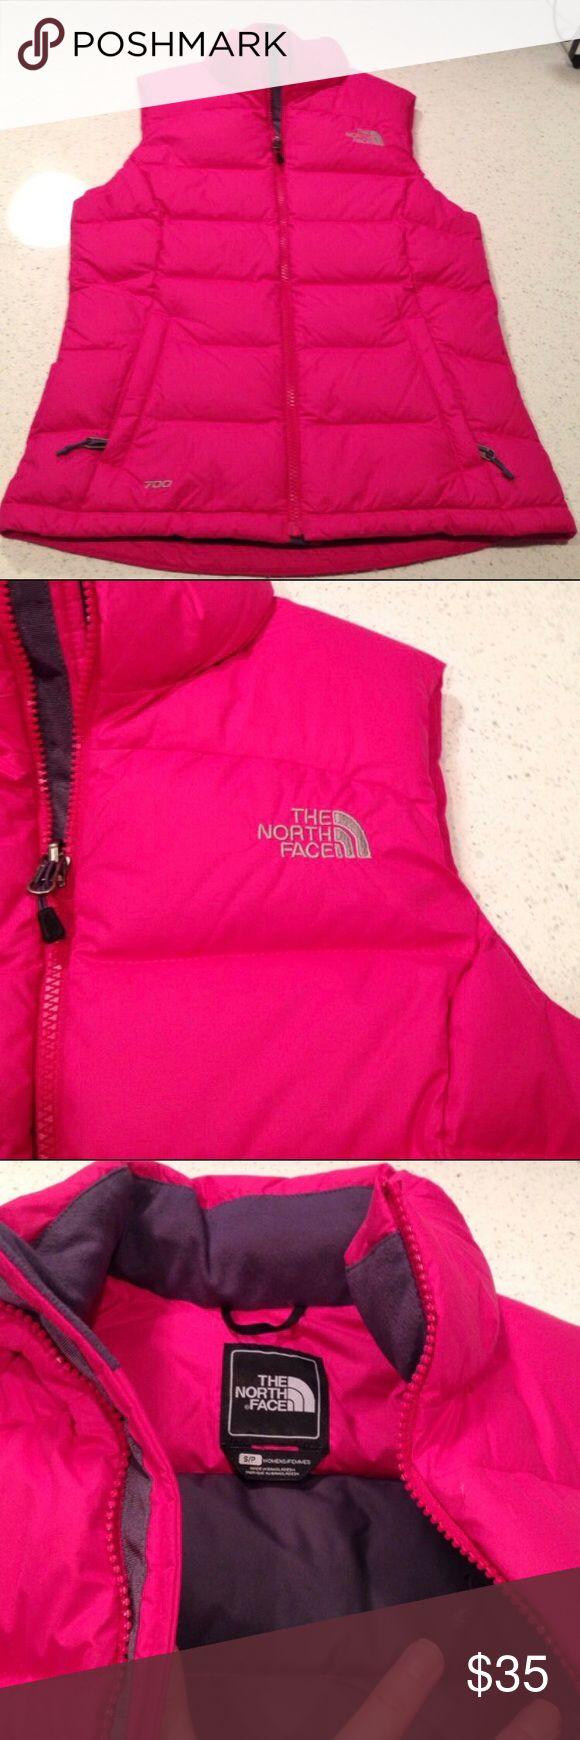 North Face Pink Vest Small 700 Series Excellent condition size small North Face vest 700 series North Face Jackets & Coats Vests